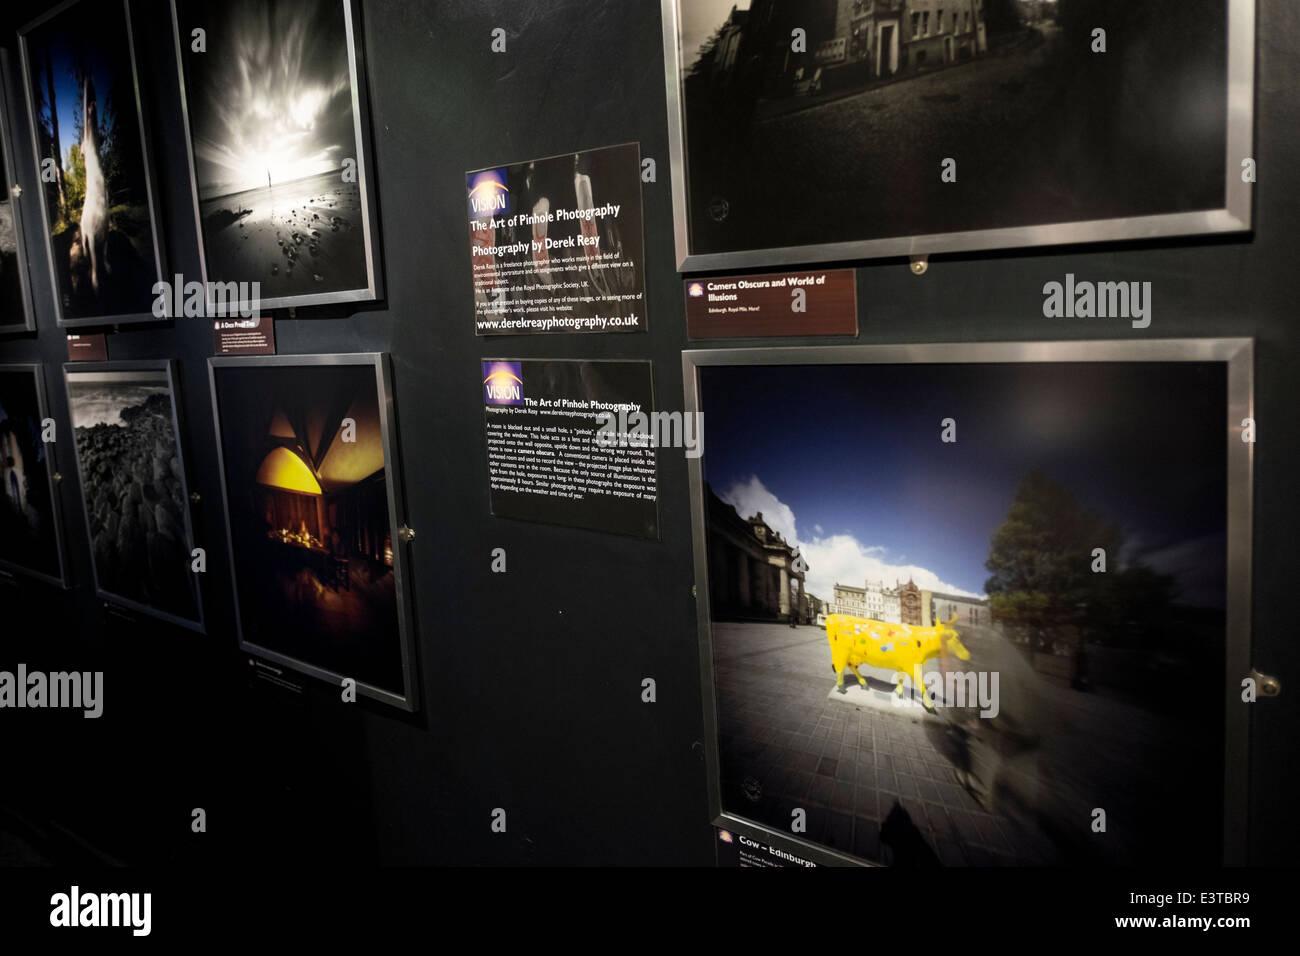 Edinburgh's Camera Obscura and World of Illusions - Stock Image